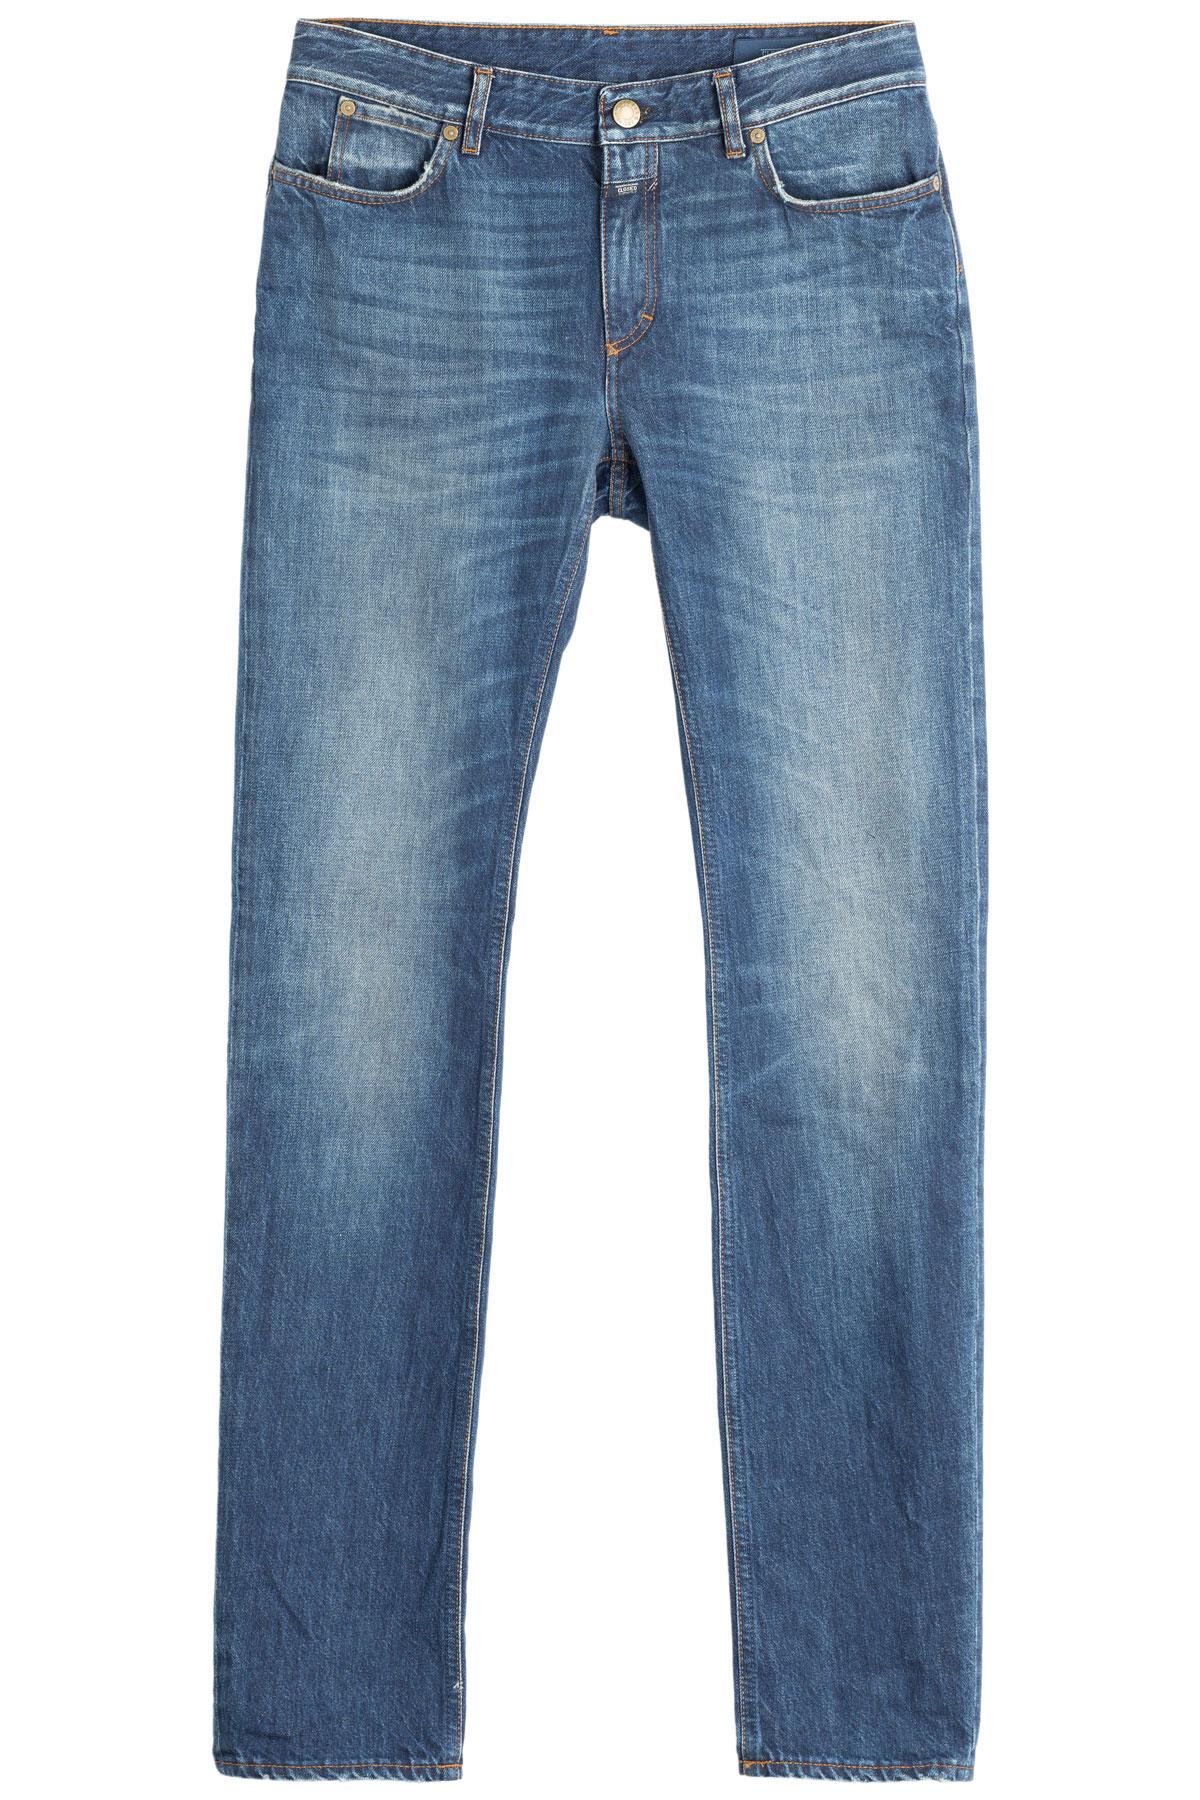 closed stonewashed skinny jeans in blue for men lyst. Black Bedroom Furniture Sets. Home Design Ideas